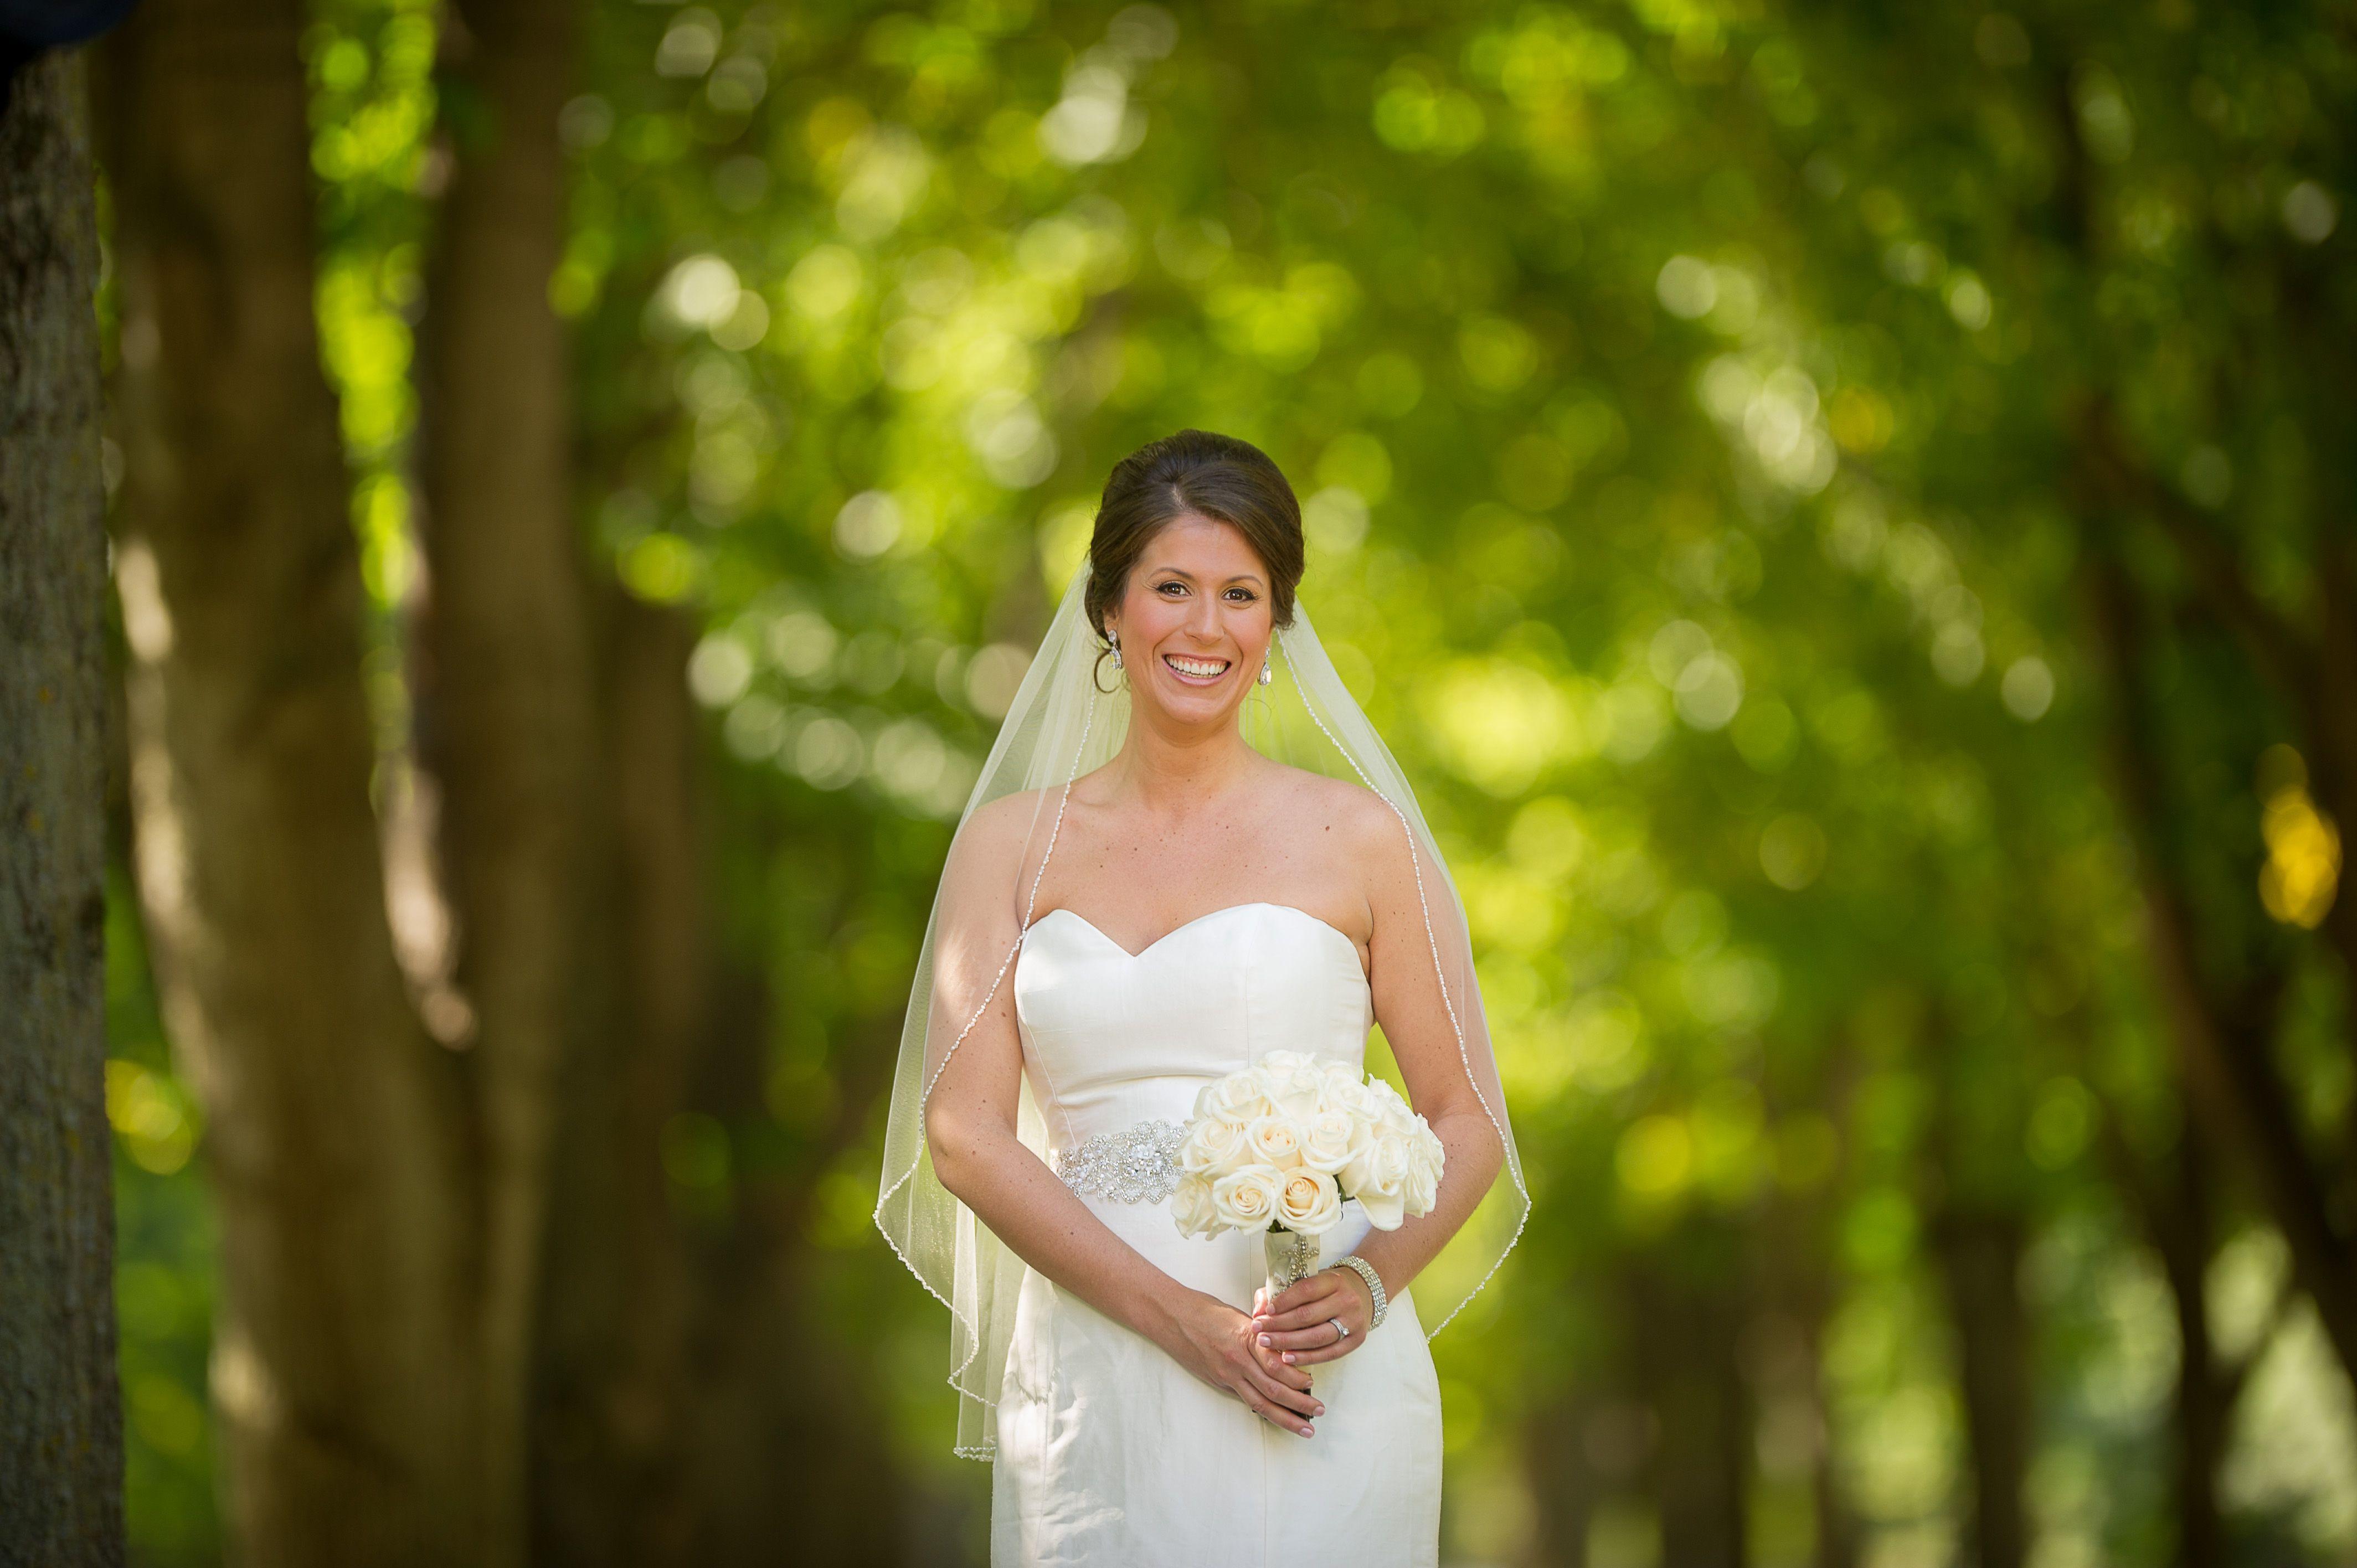 Savannah beautiful wedding and products